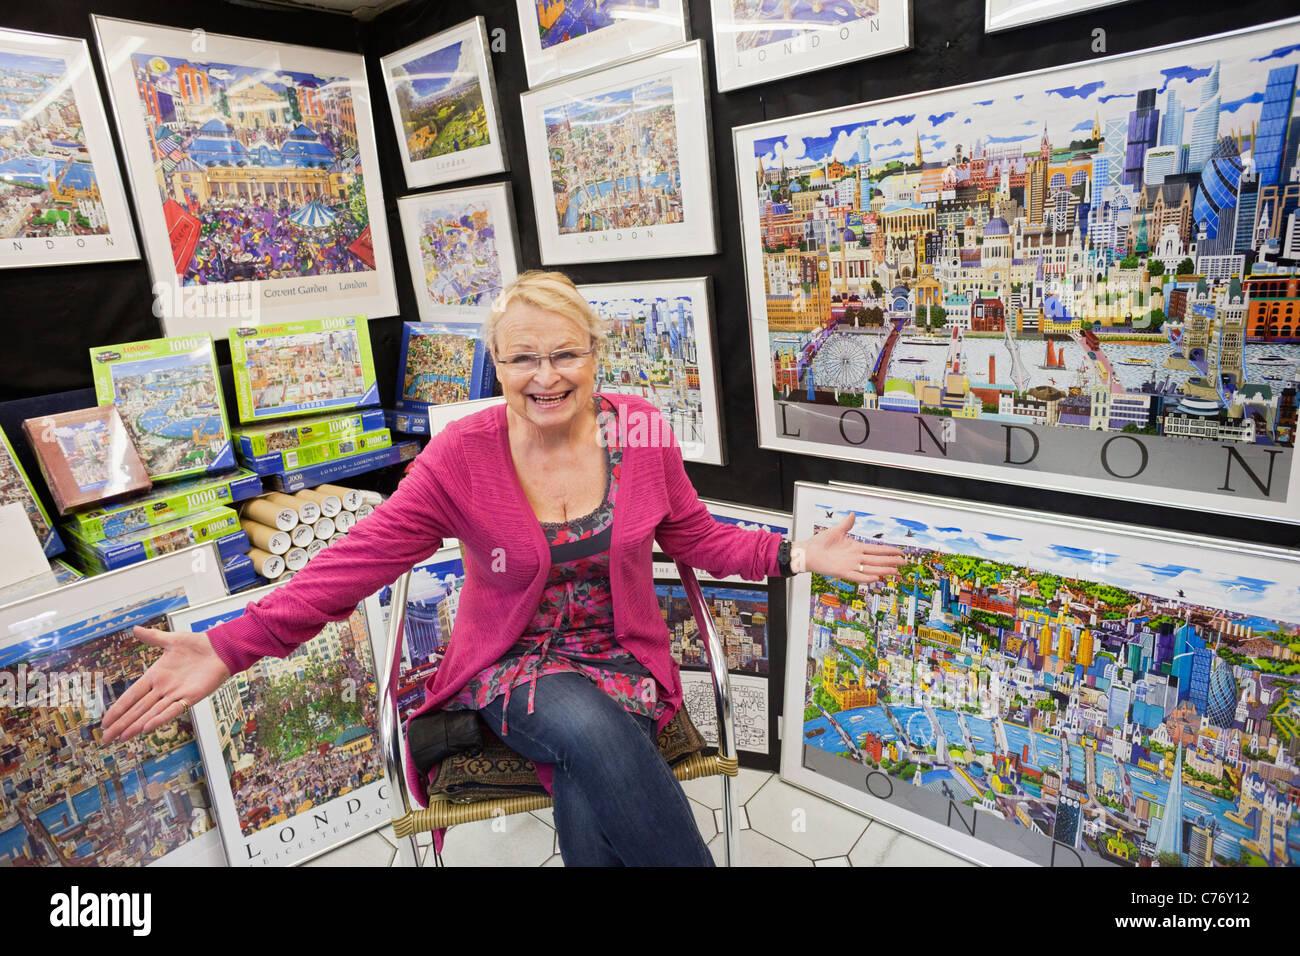 England, London, Covent Garden, Jubilee Market, Poster Shop Stock ...